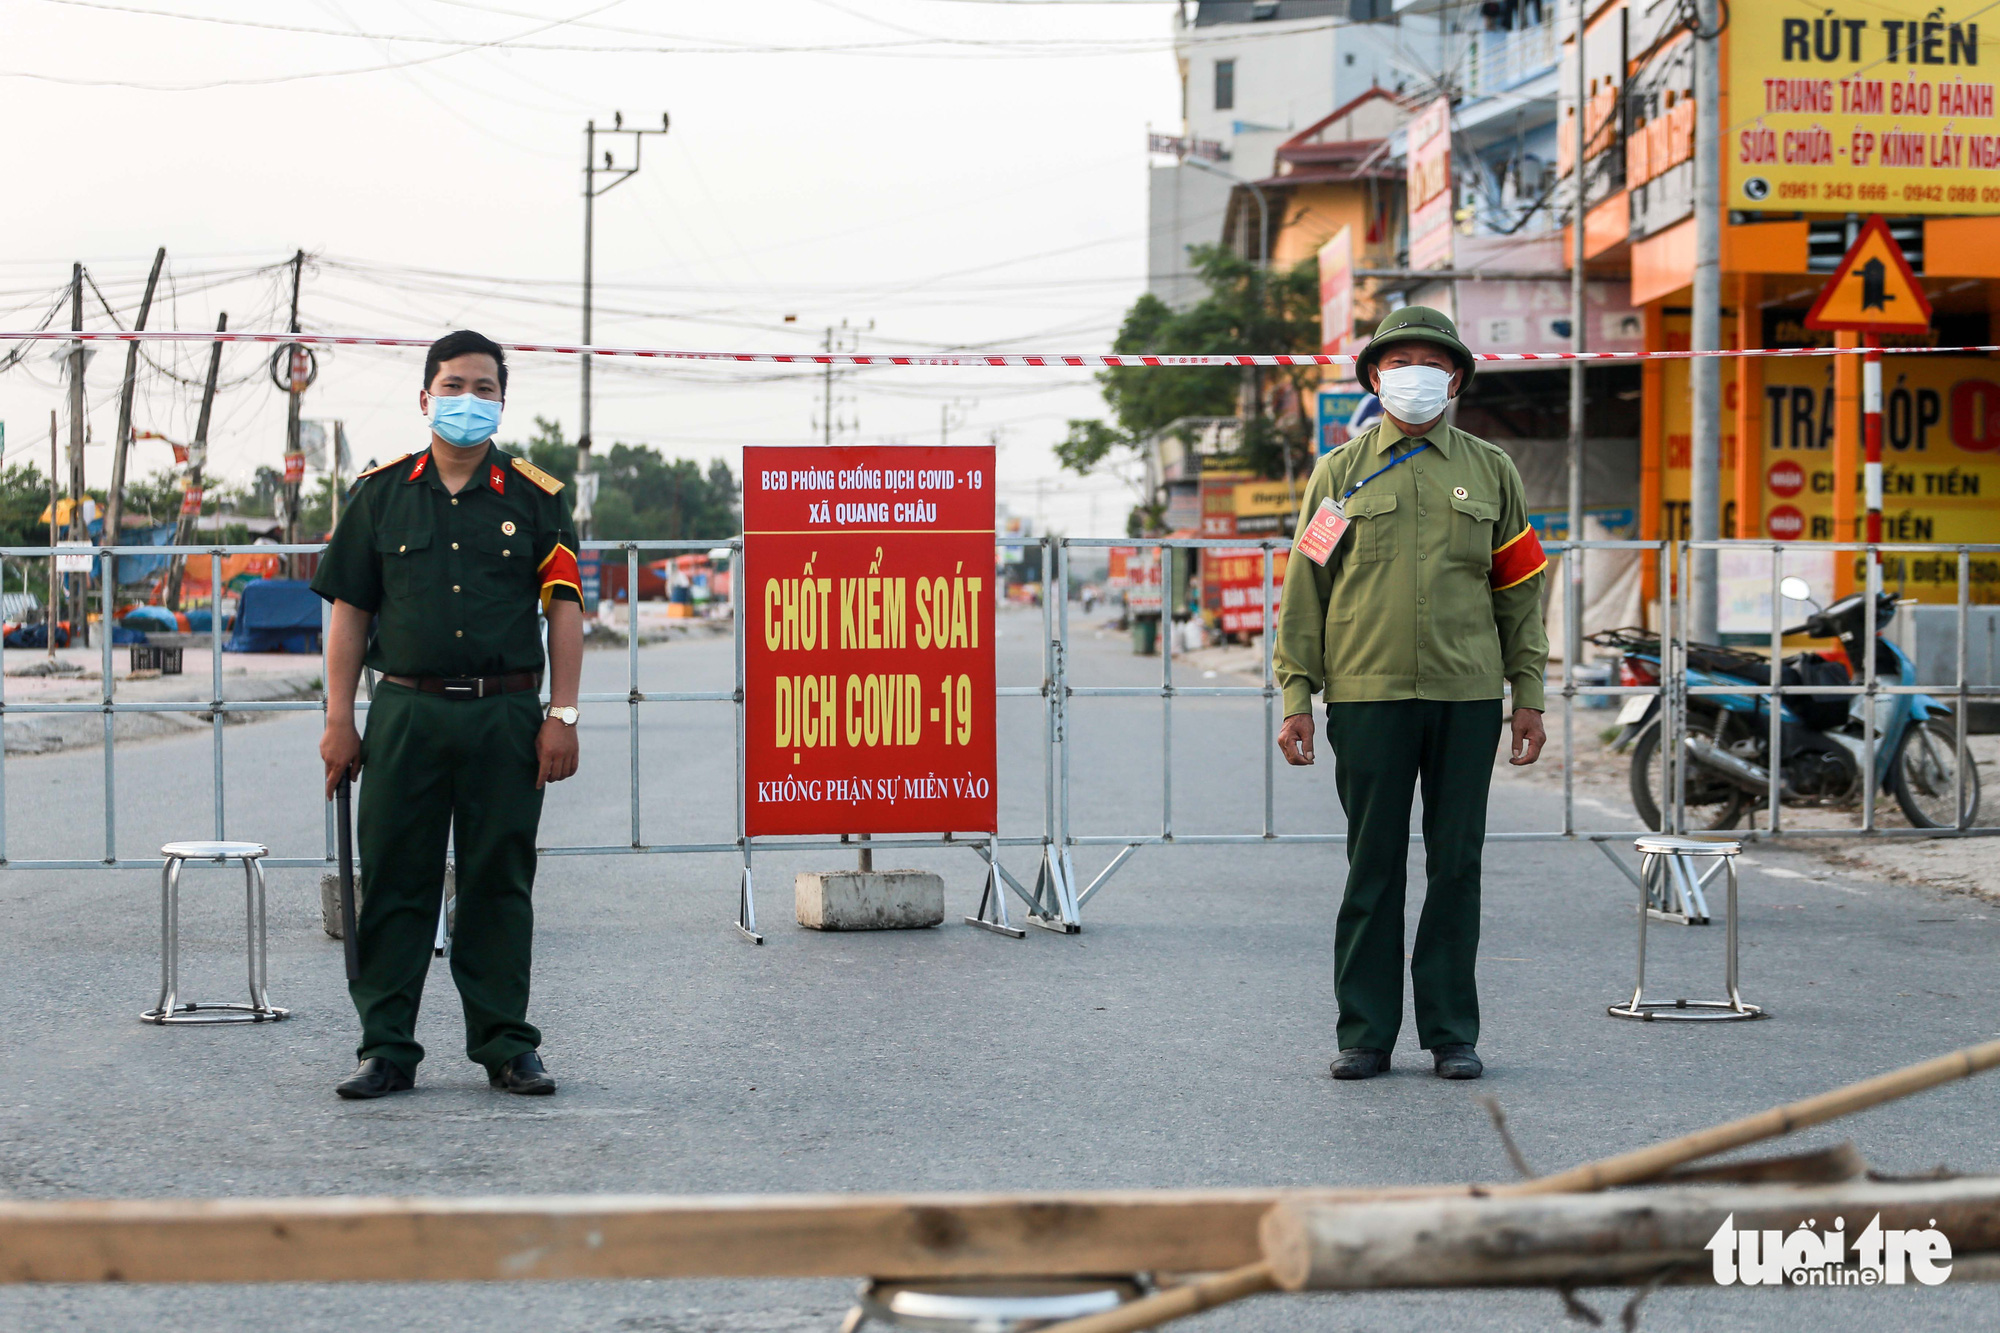 Vietnamese woman dies from heart attack in COVID-19 quarantine ward